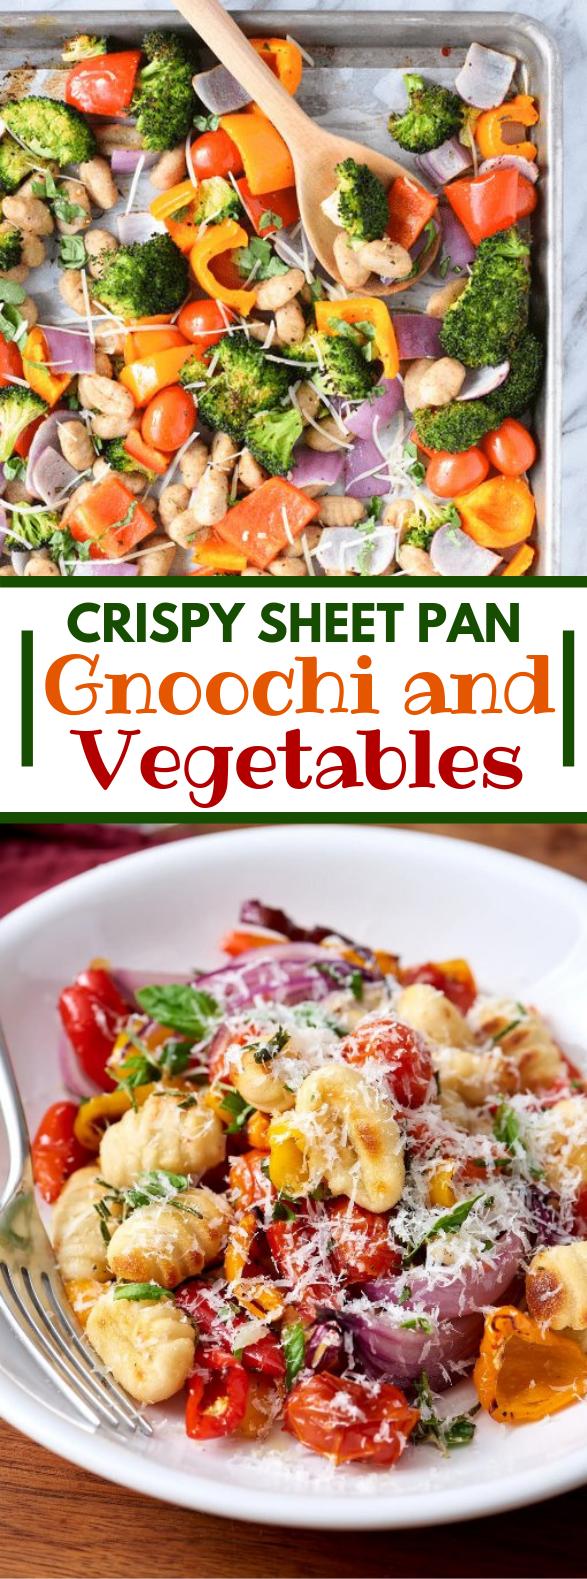 Crispy Sheet Pan Gnocchi and Veggies #vegetarian #onepandinner